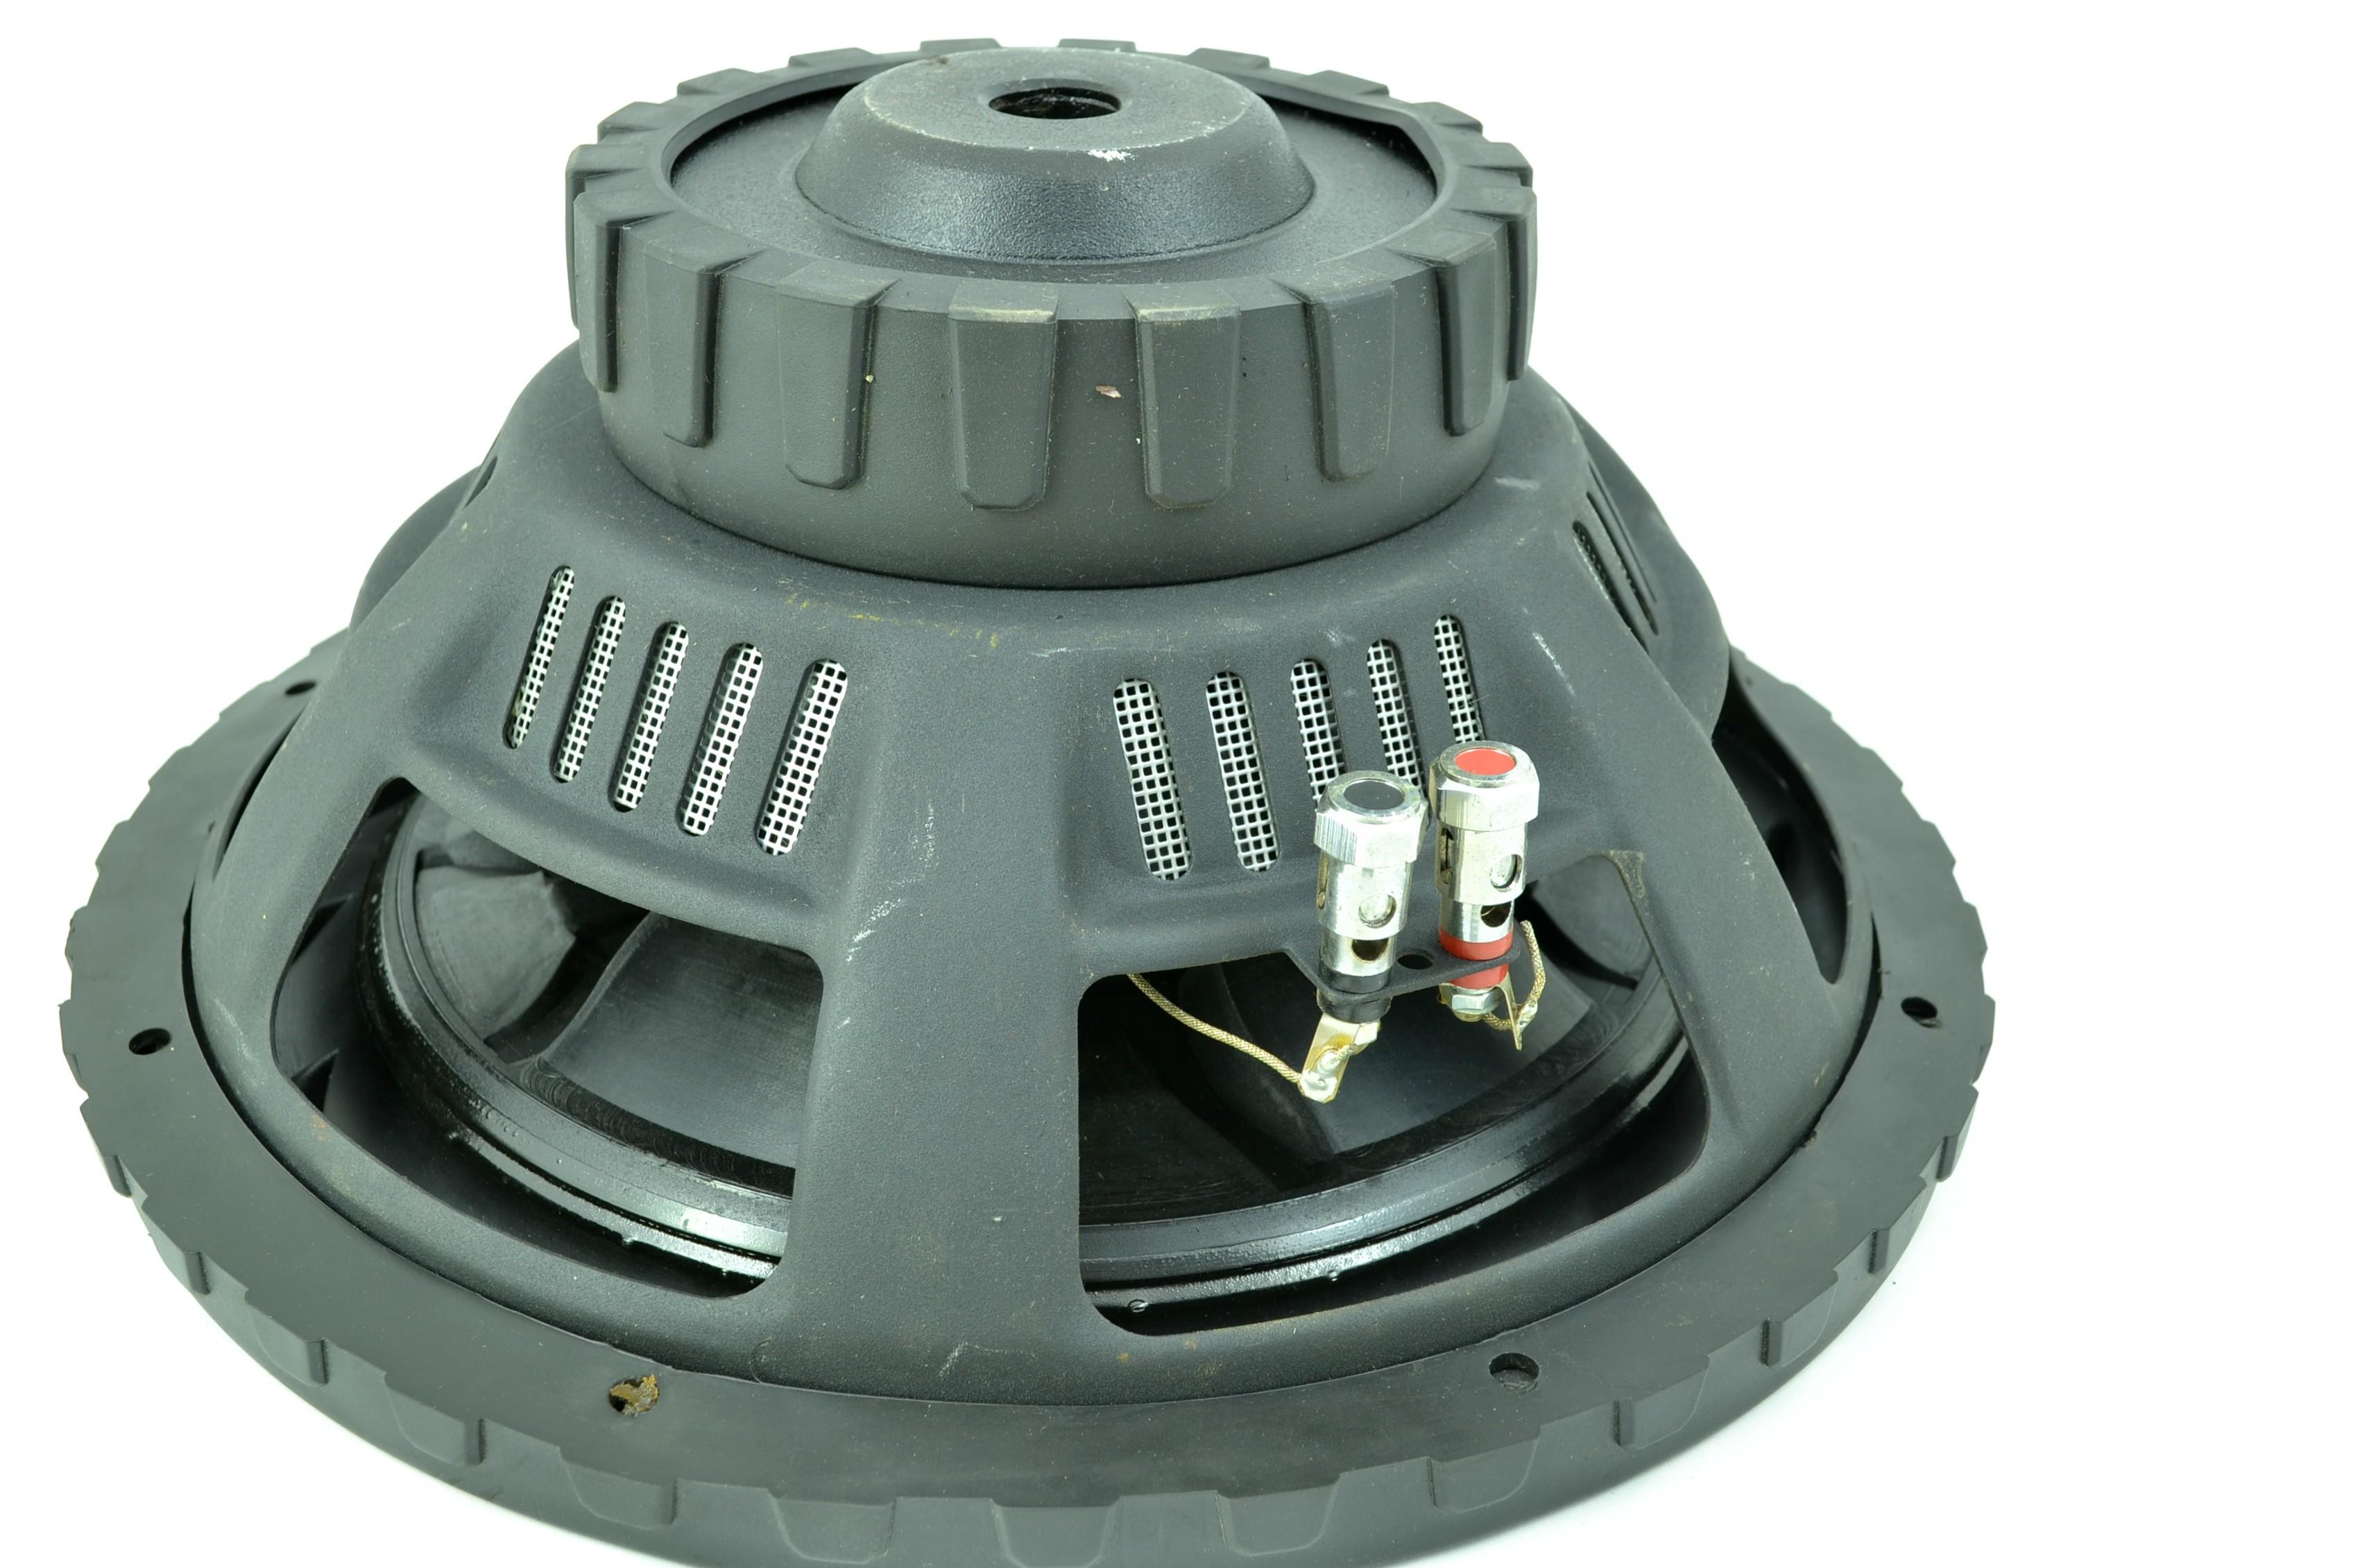 Mощен субуфер SSound MW 1224 600W - 12 инча